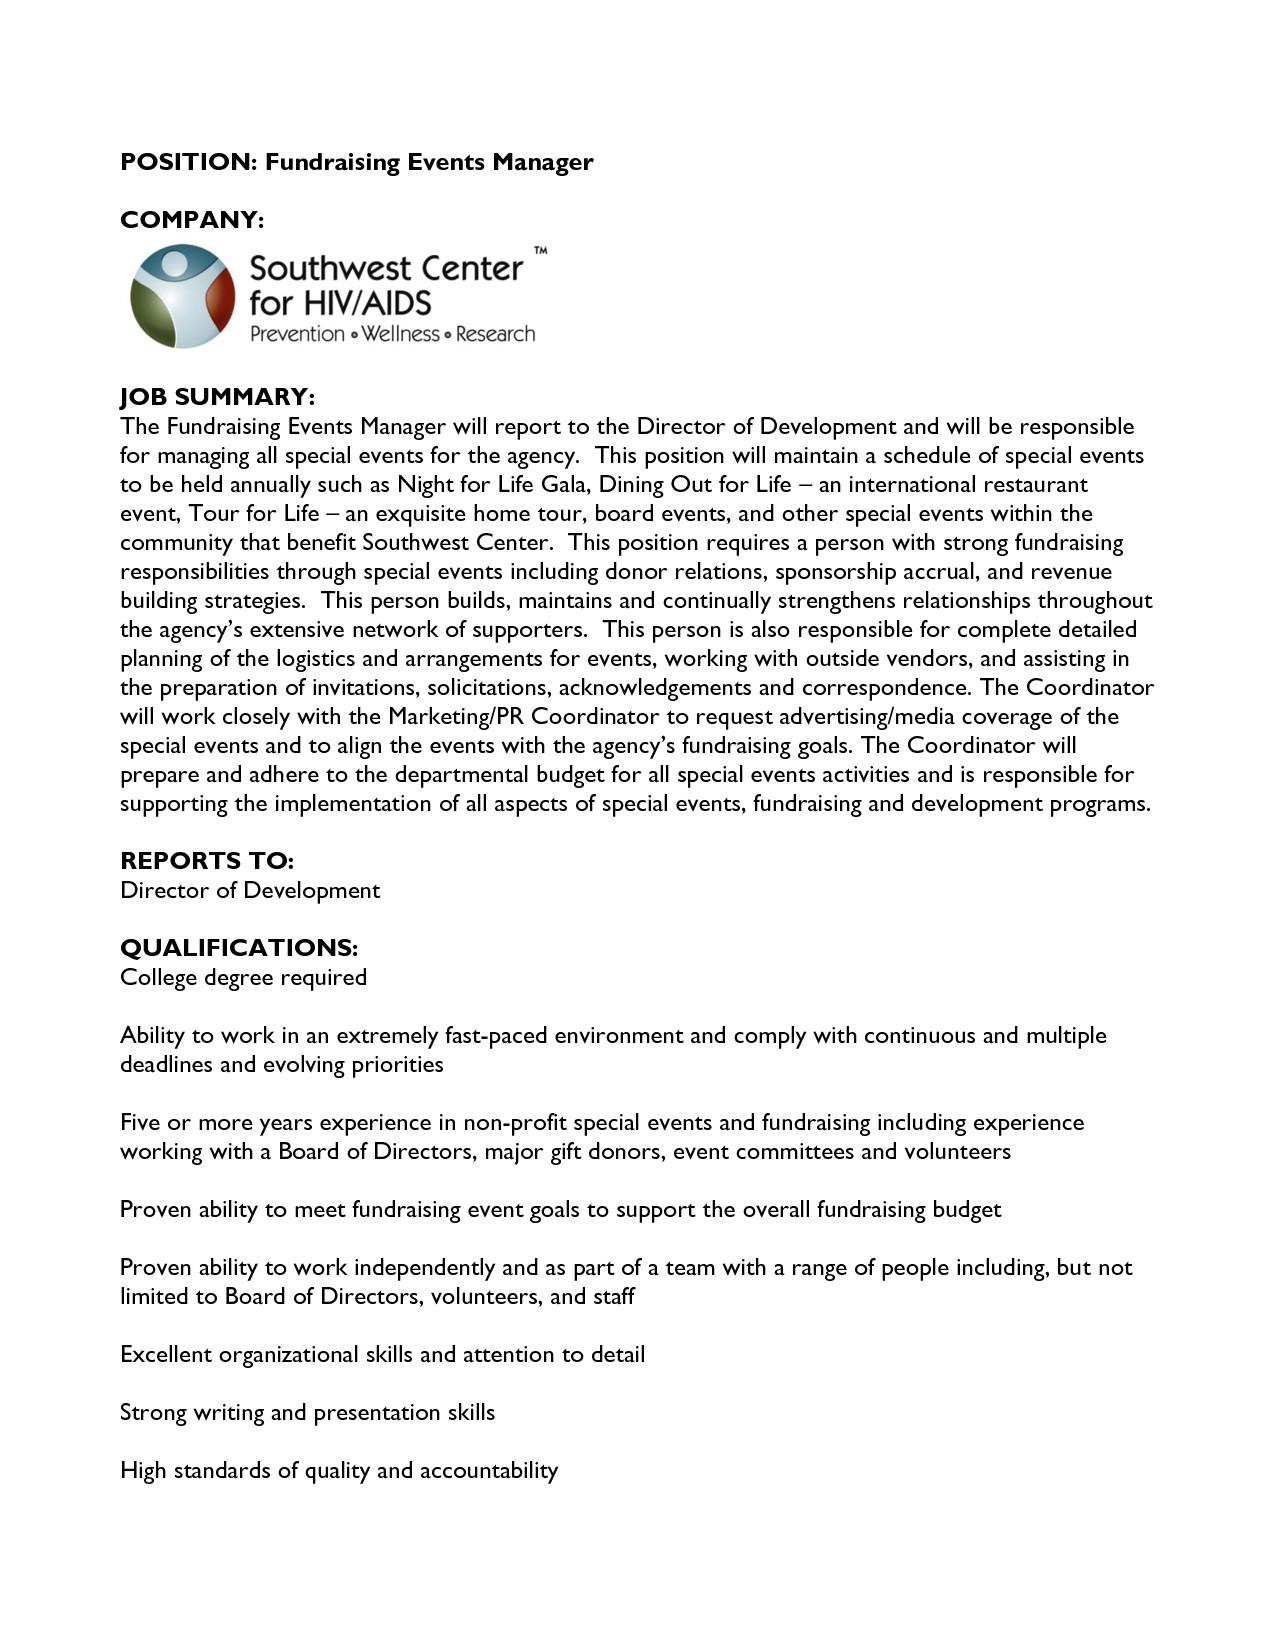 cover letter for fundraising job